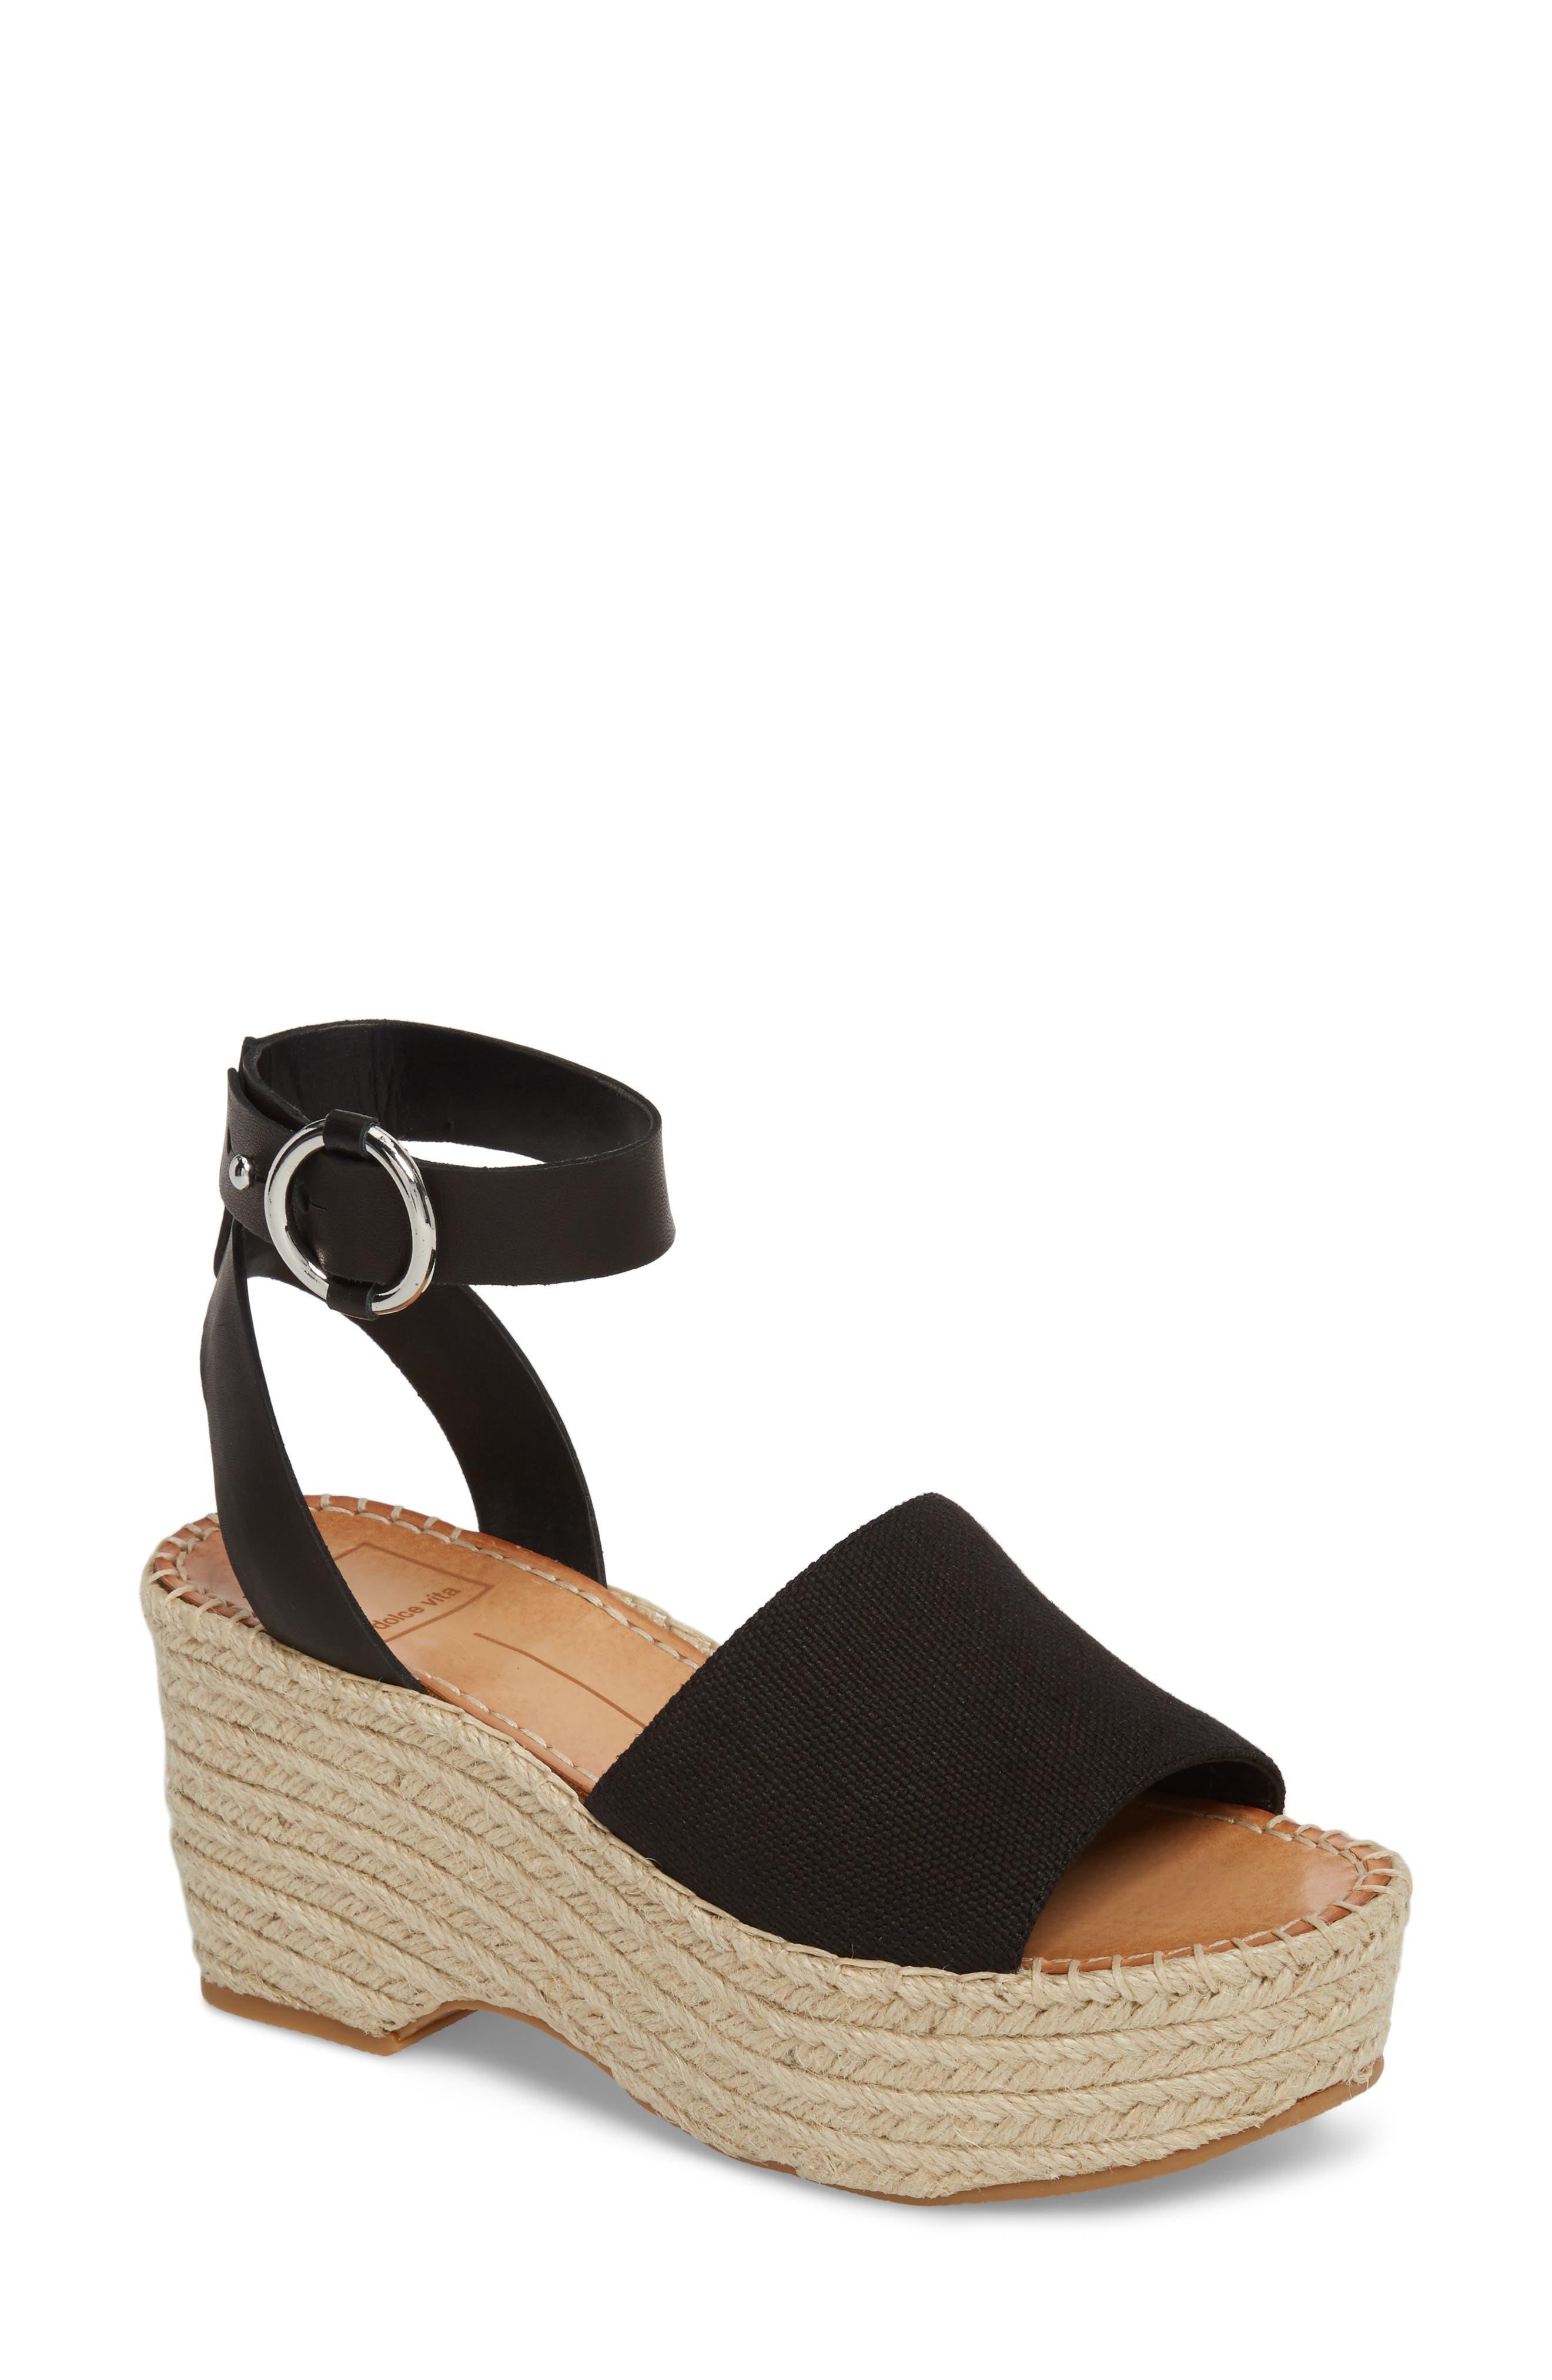 DOLCE VITA, Lesly Espadrille Platform Sandal, Main thumbnail 1, color, 001